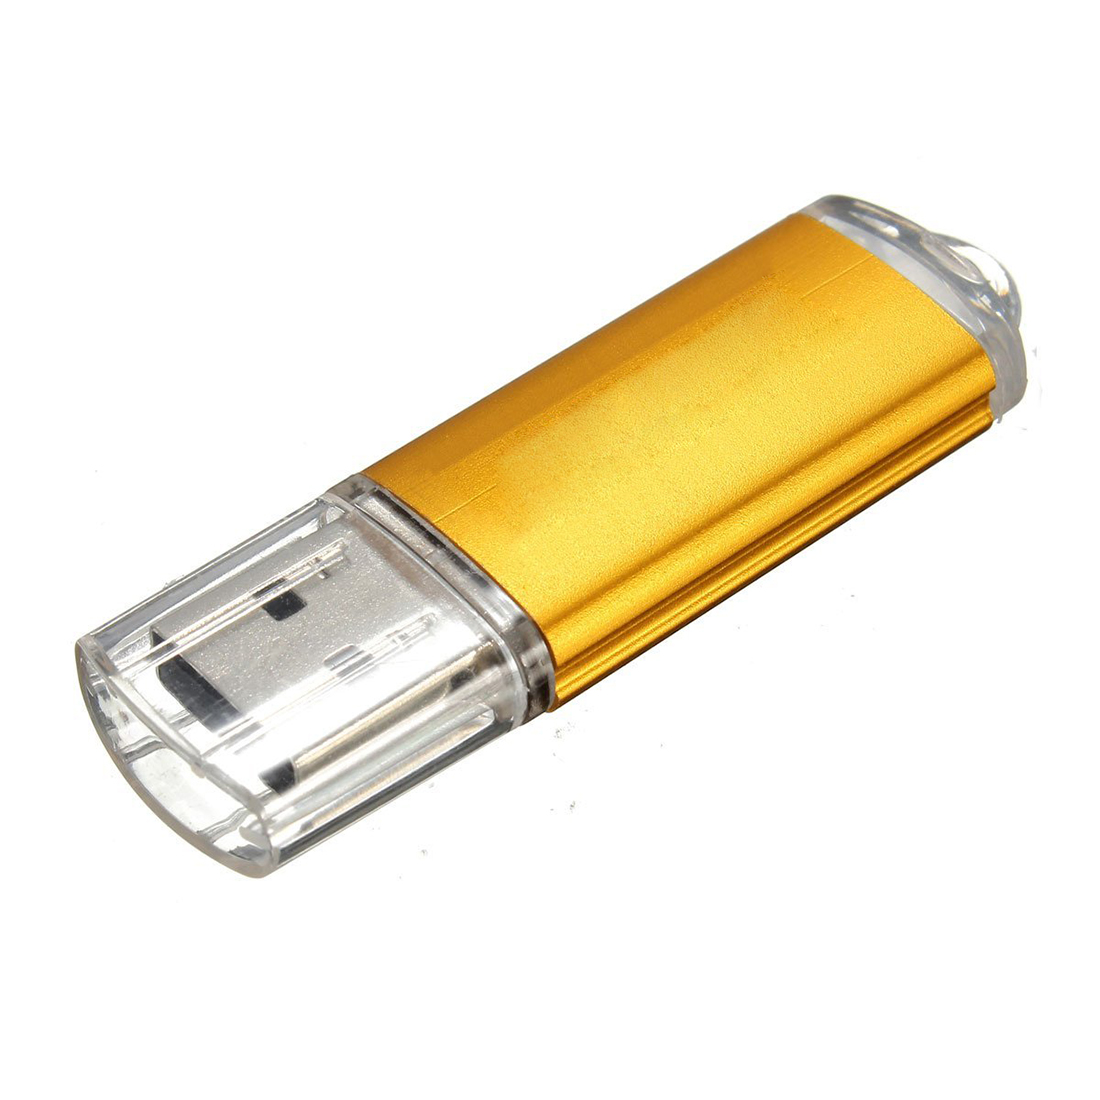 5 x 8GB USB 2 0 Memory Stick Flash Drive Memory Data Stick Gold